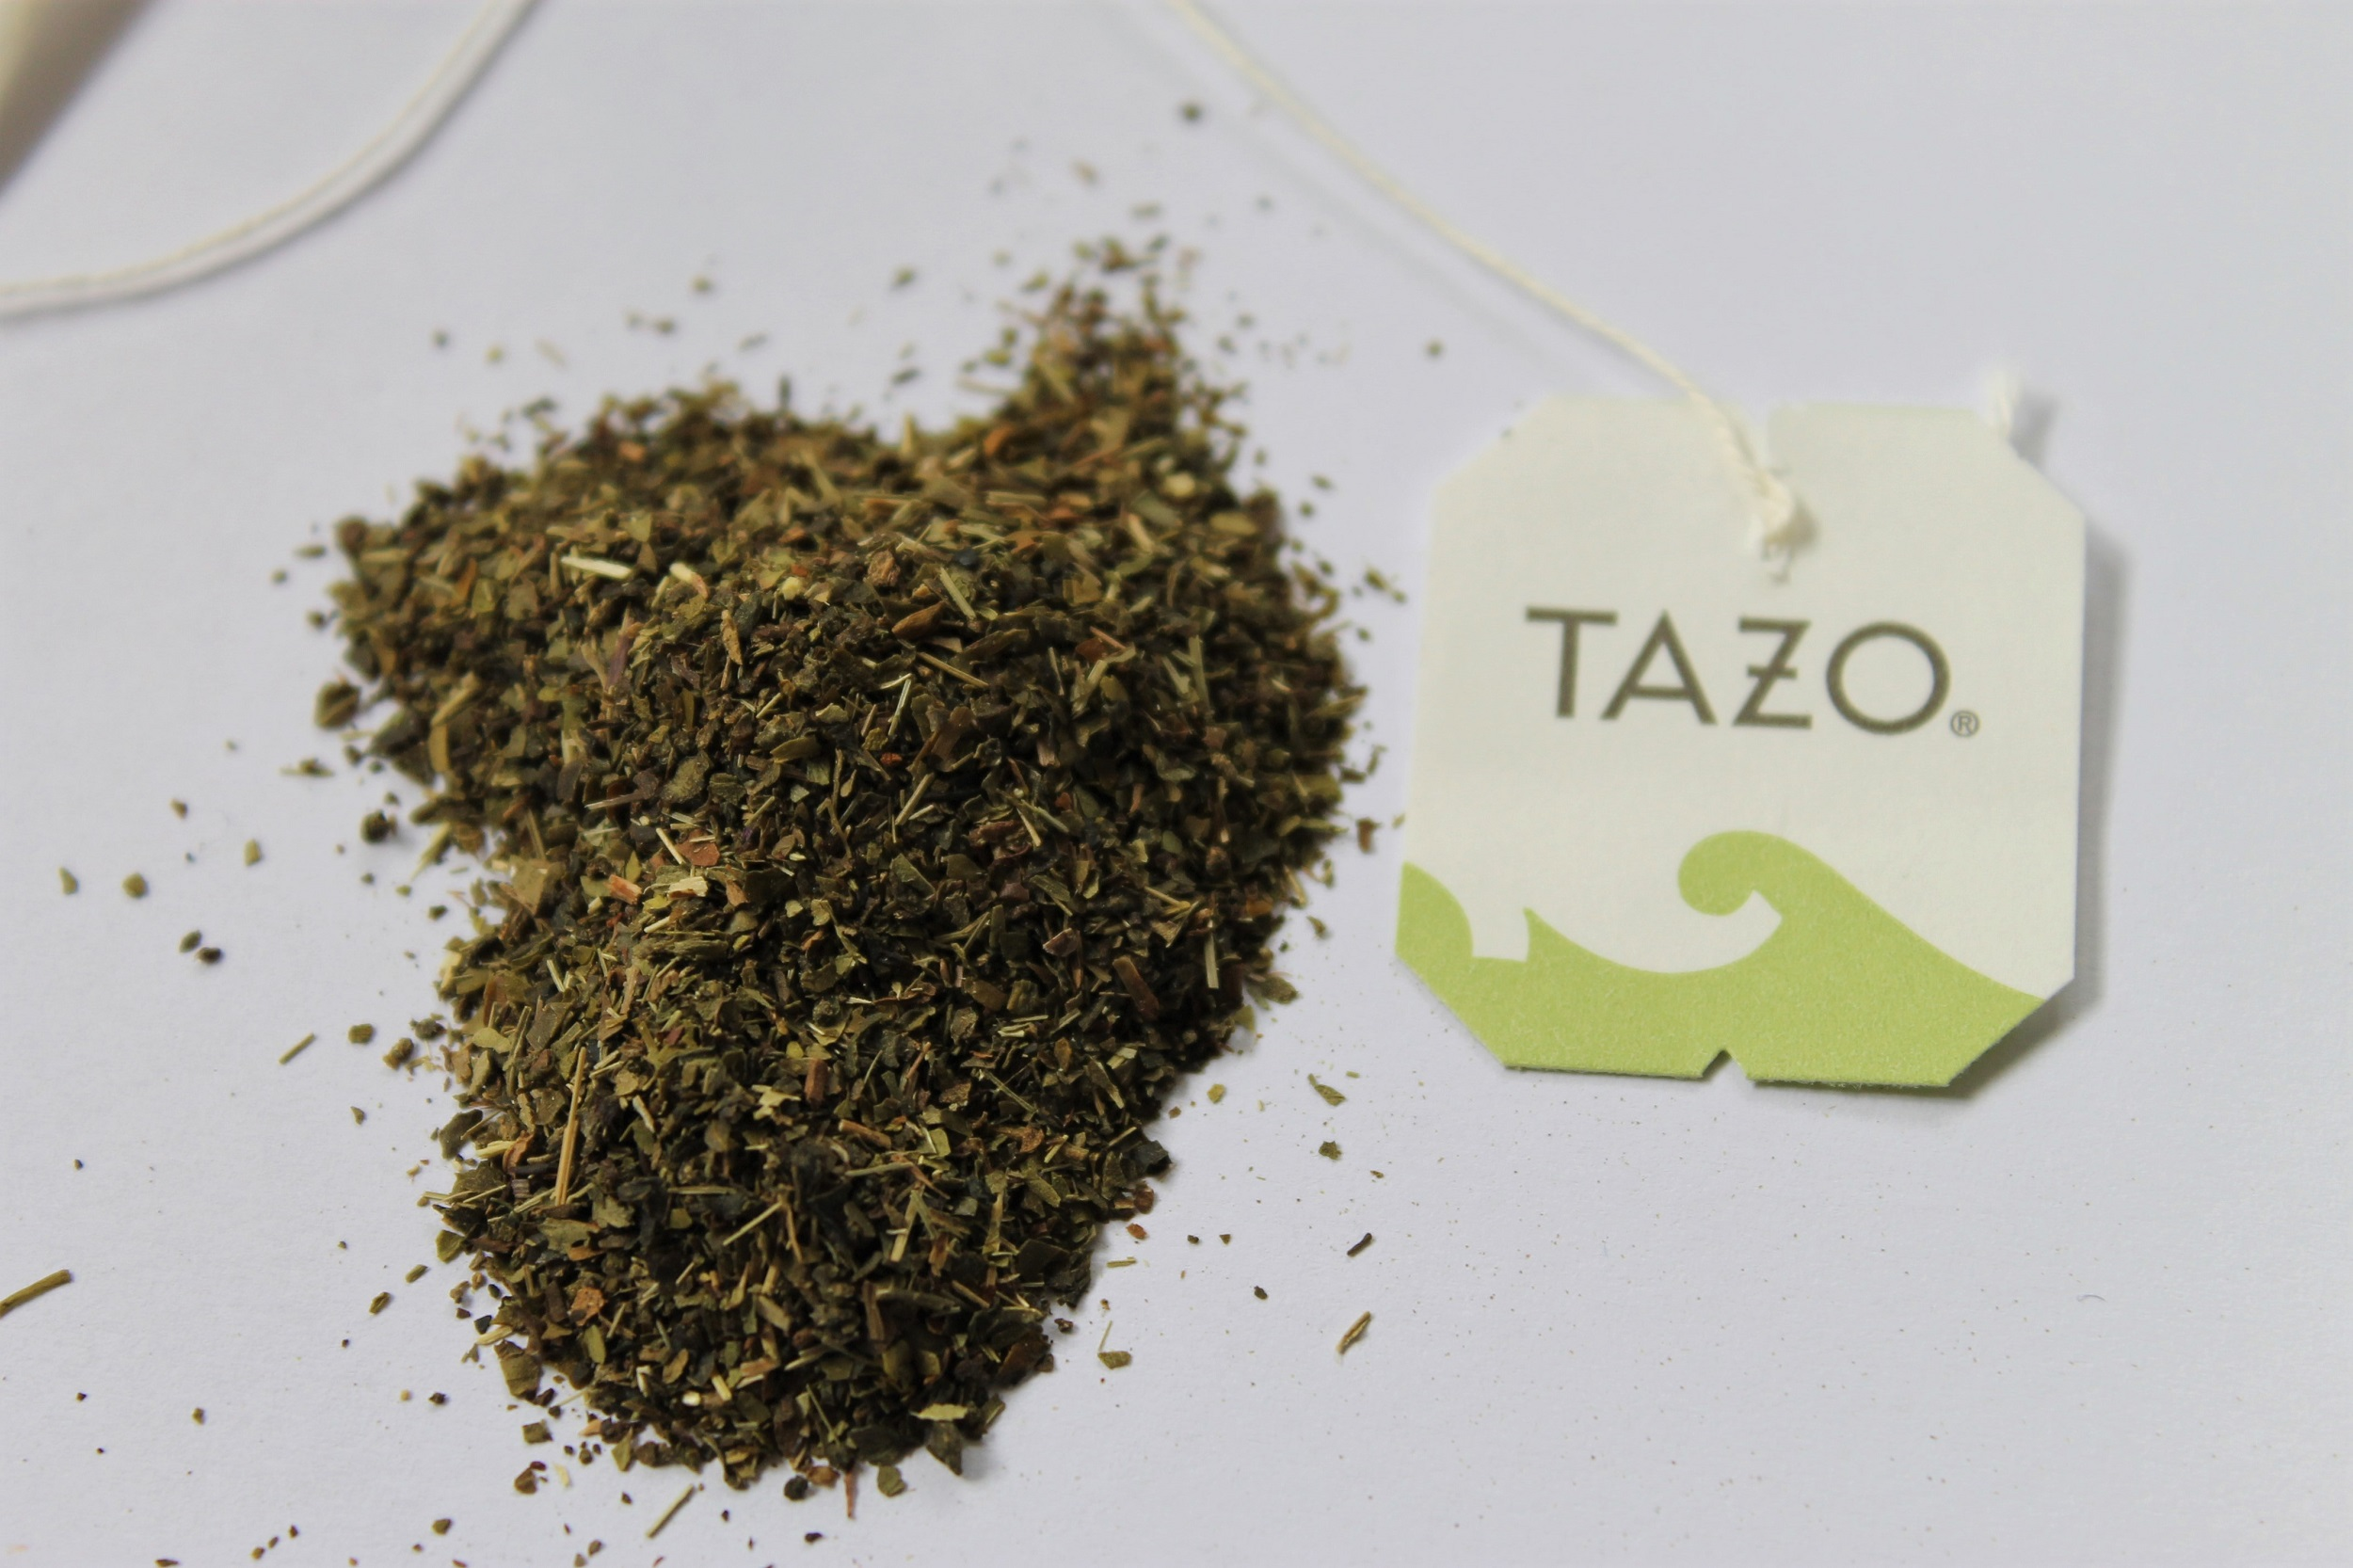 tazo green tea blend